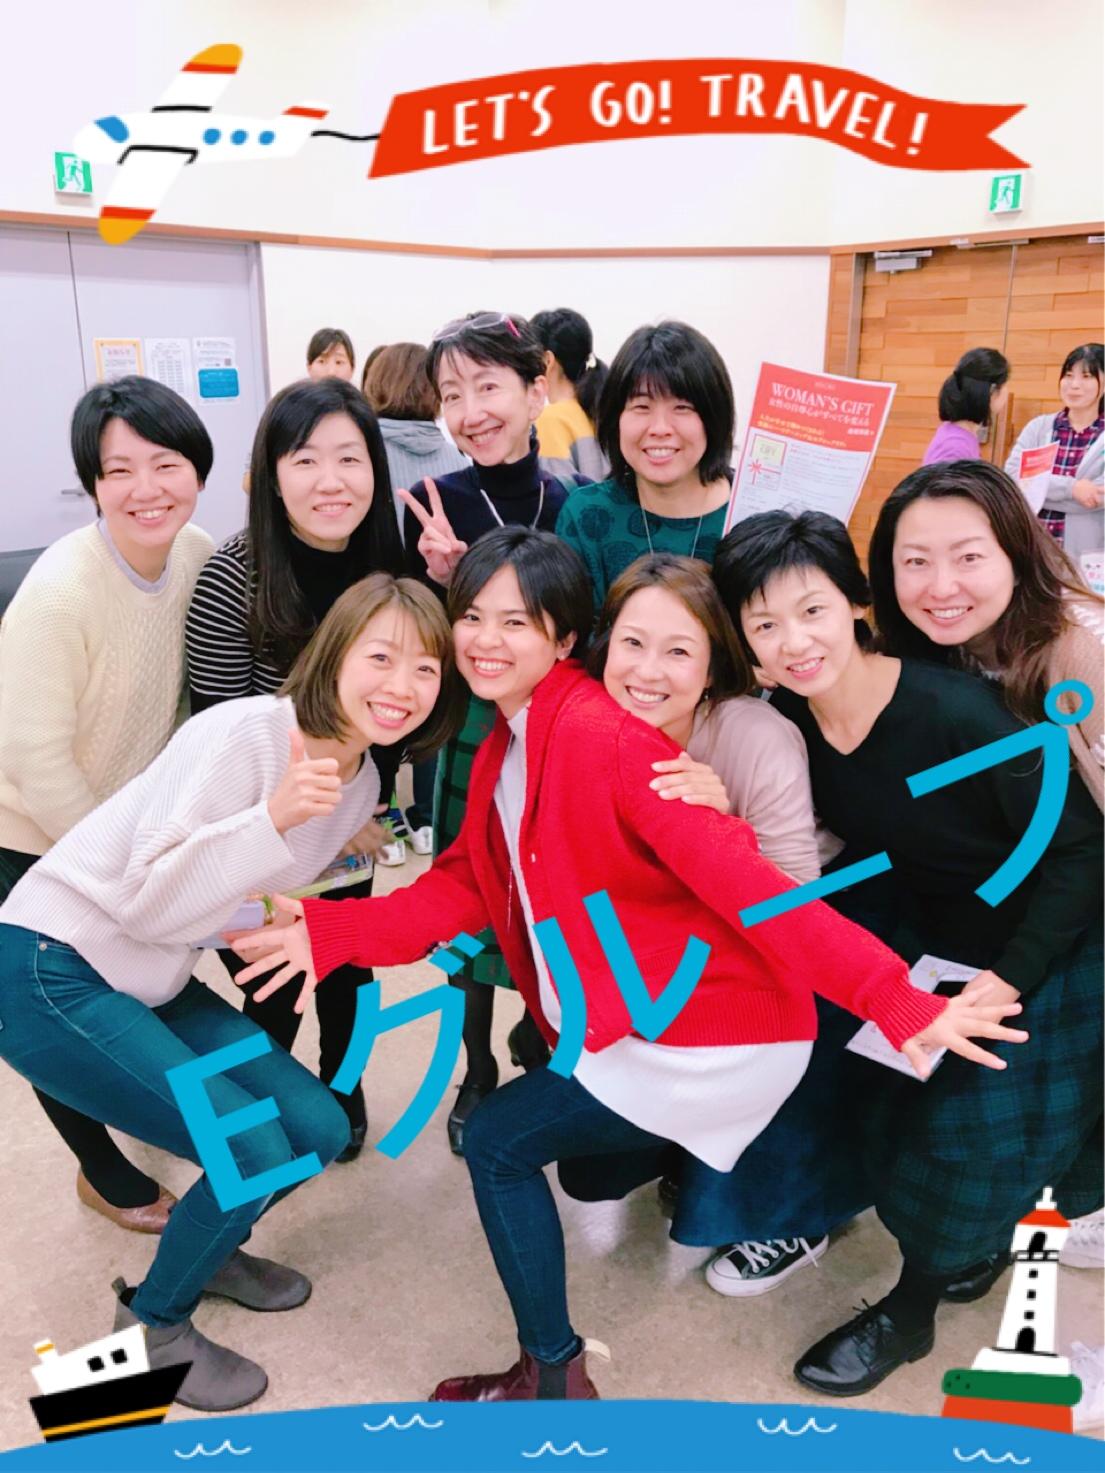 2019/11/26 1010HAPPY 藤沢クラス Eグループ